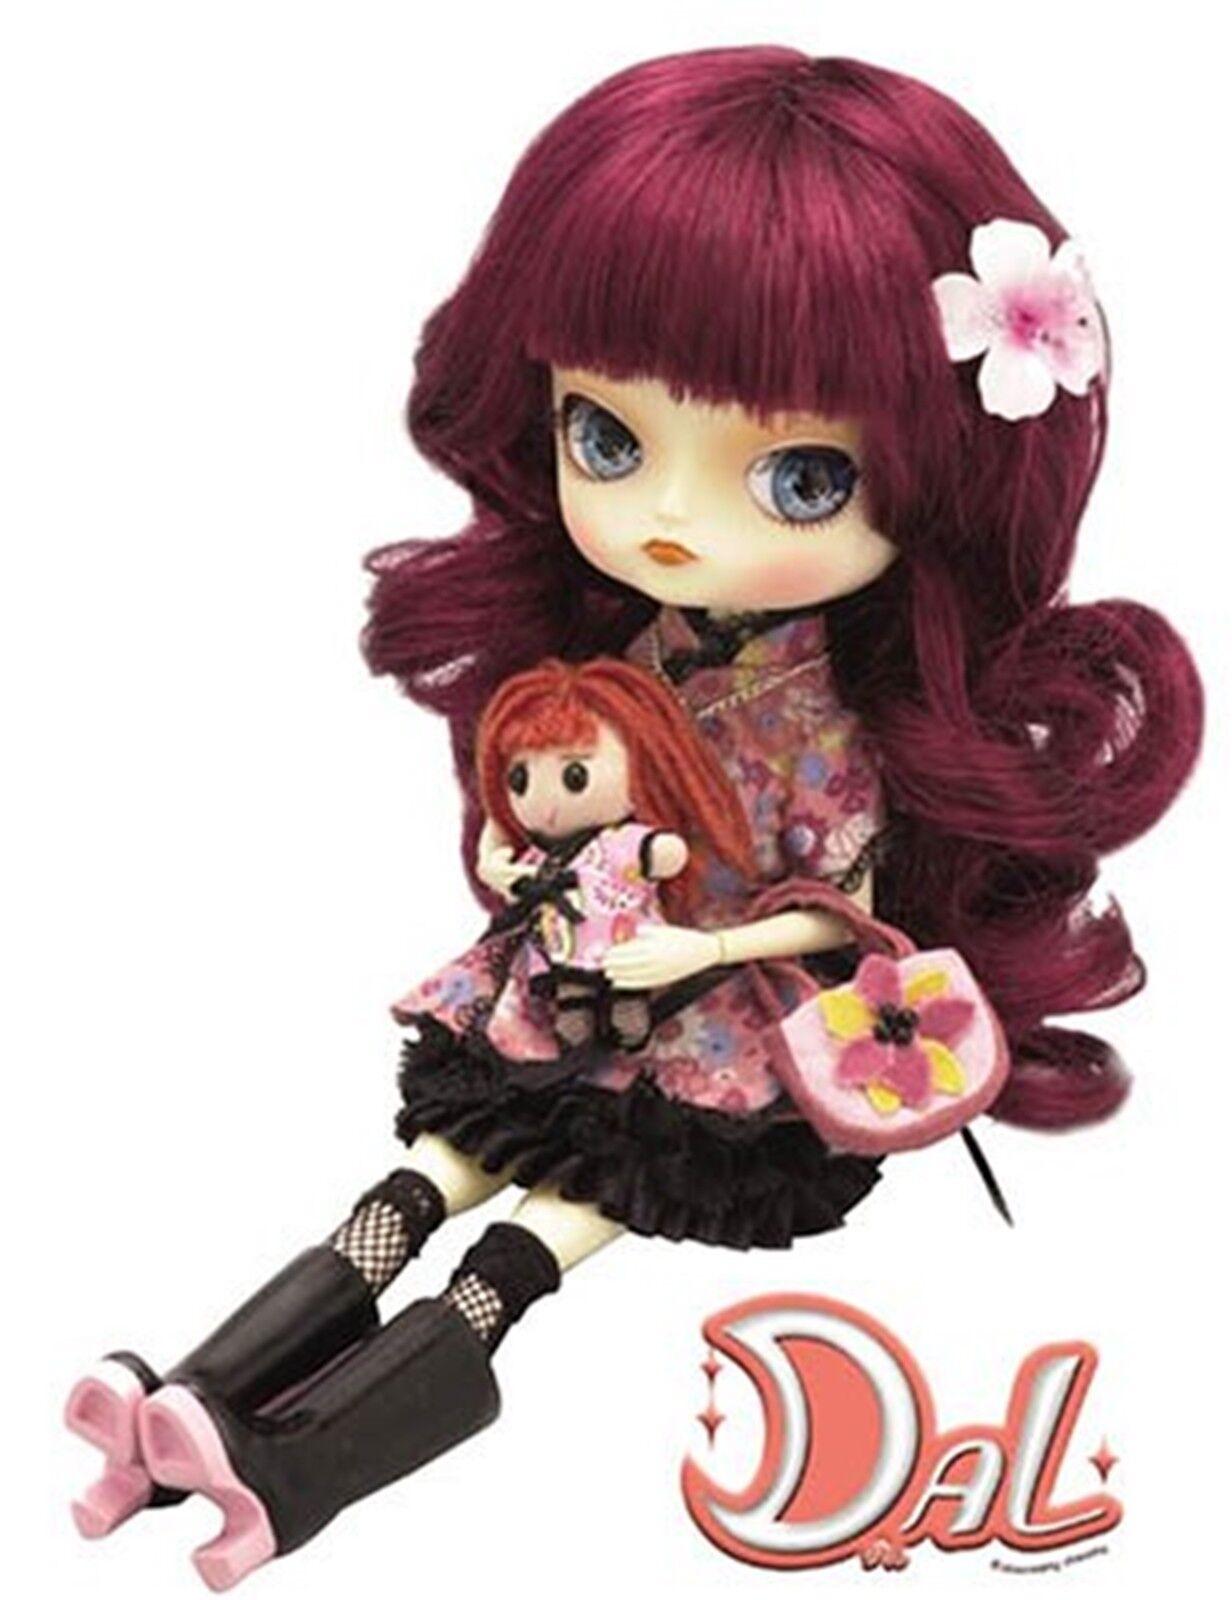 Pullip Dal Fiori Modischer Japan Doll Import Figures F-301 Jun Planning Neuer